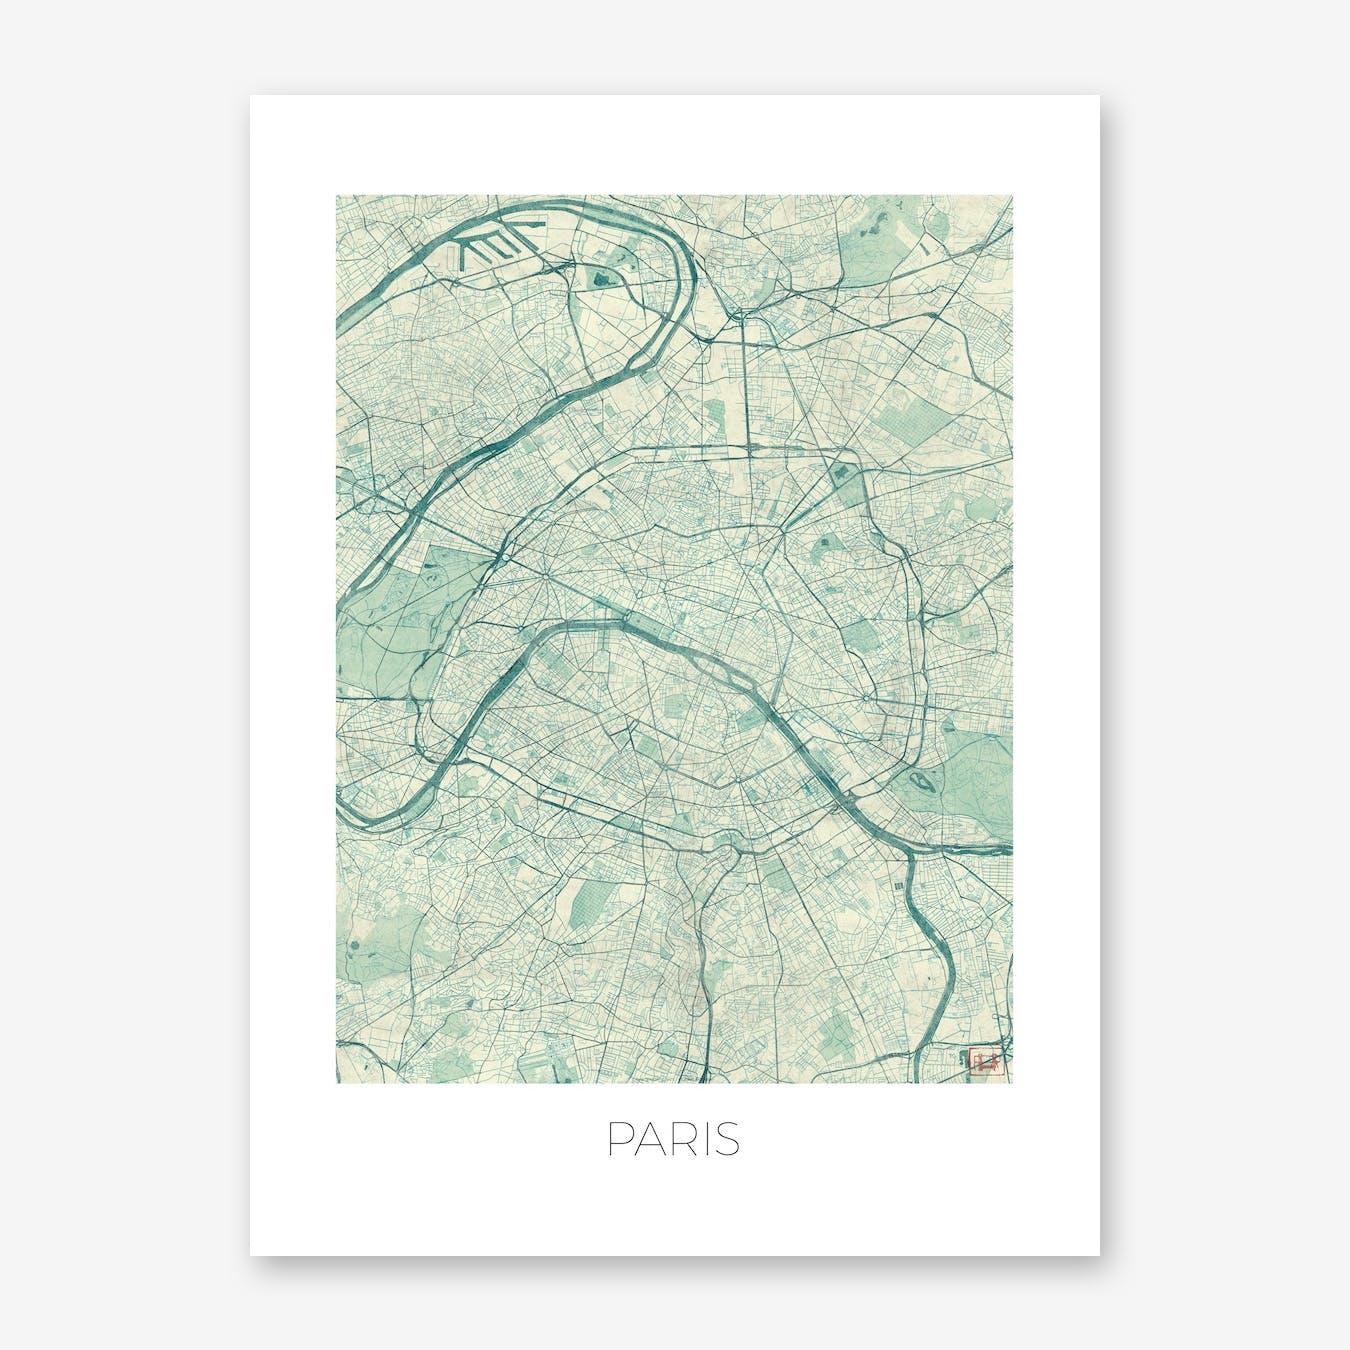 Paris Map Vintage in Blue